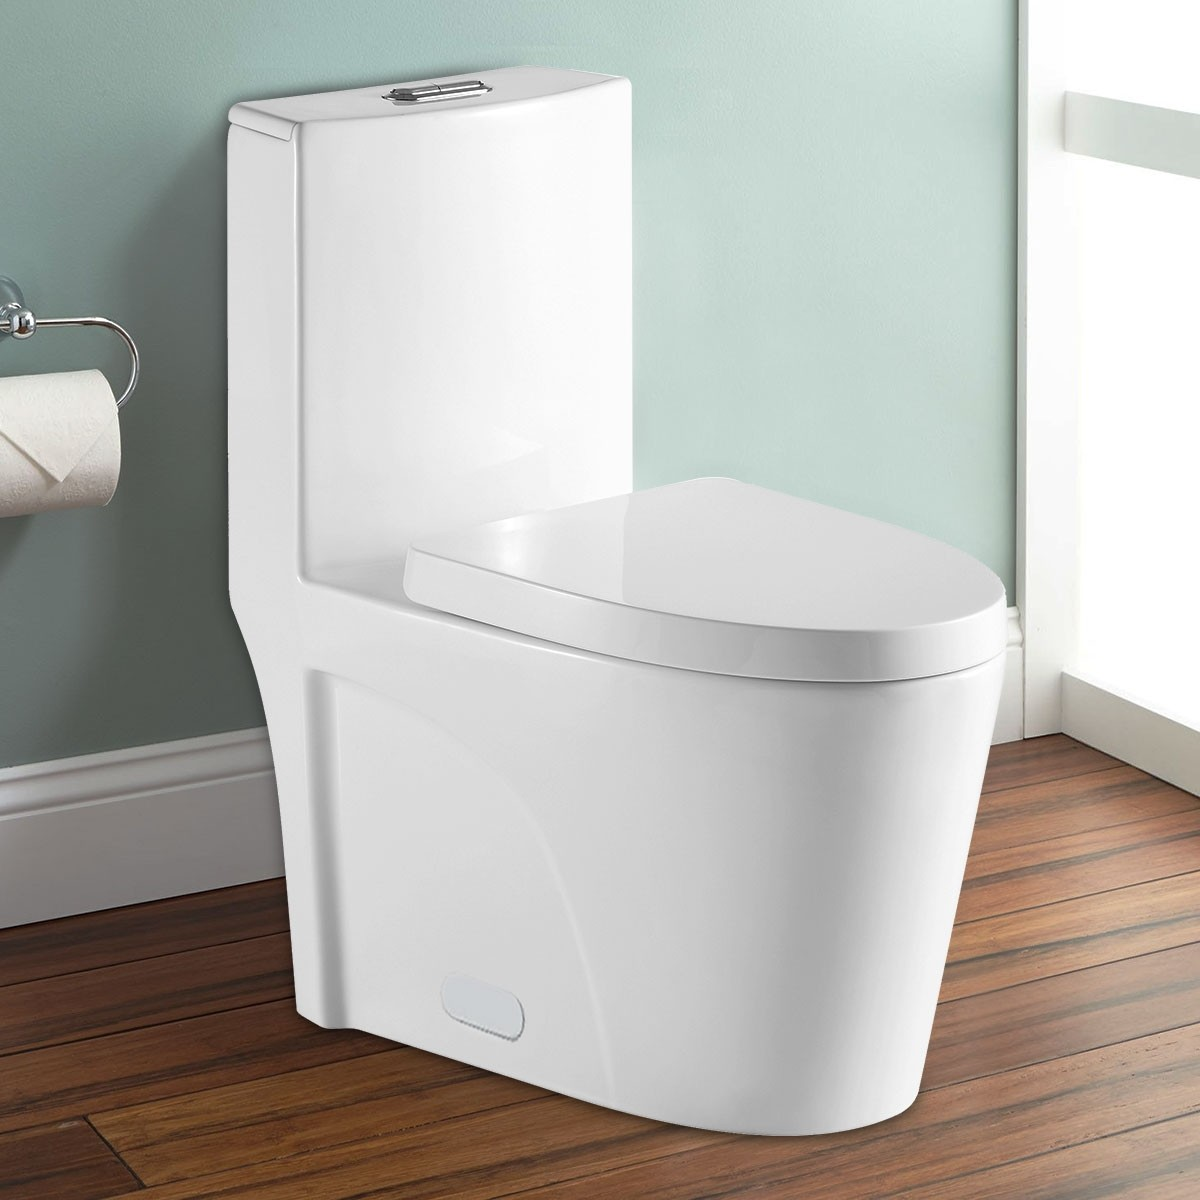 Dual Flush Water Saving Ceramic One-piece Toilet (DK-ZBQ-12011)